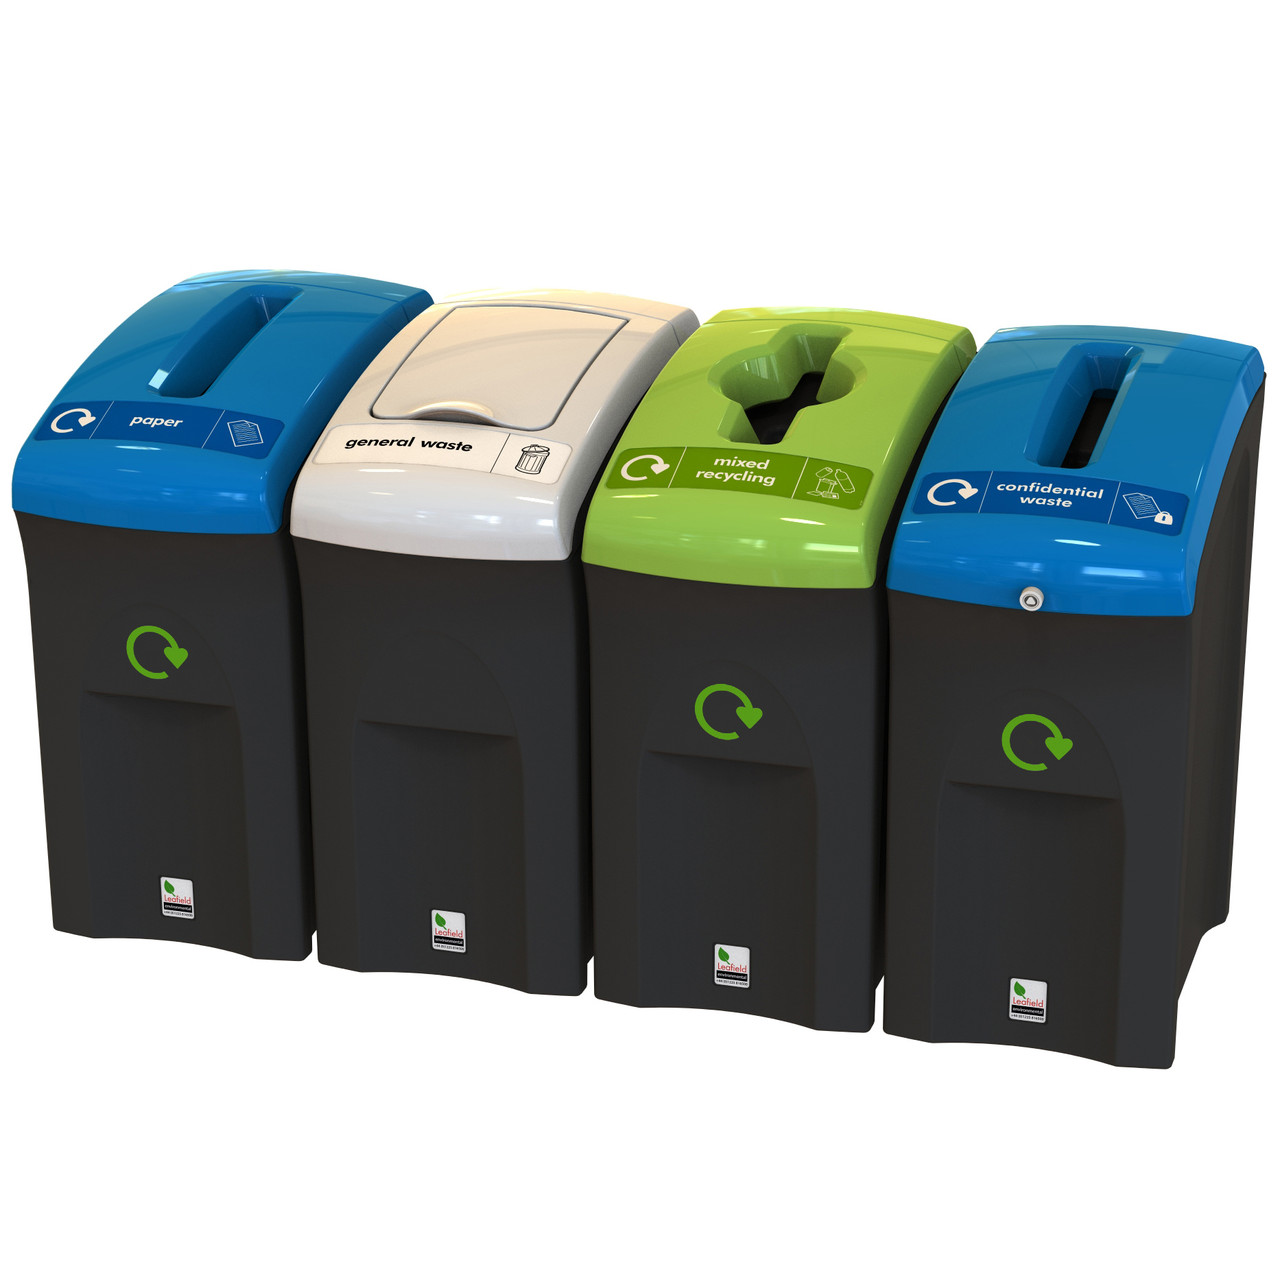 EnviroBin Mini Recycling Litter Bin 55 Litre